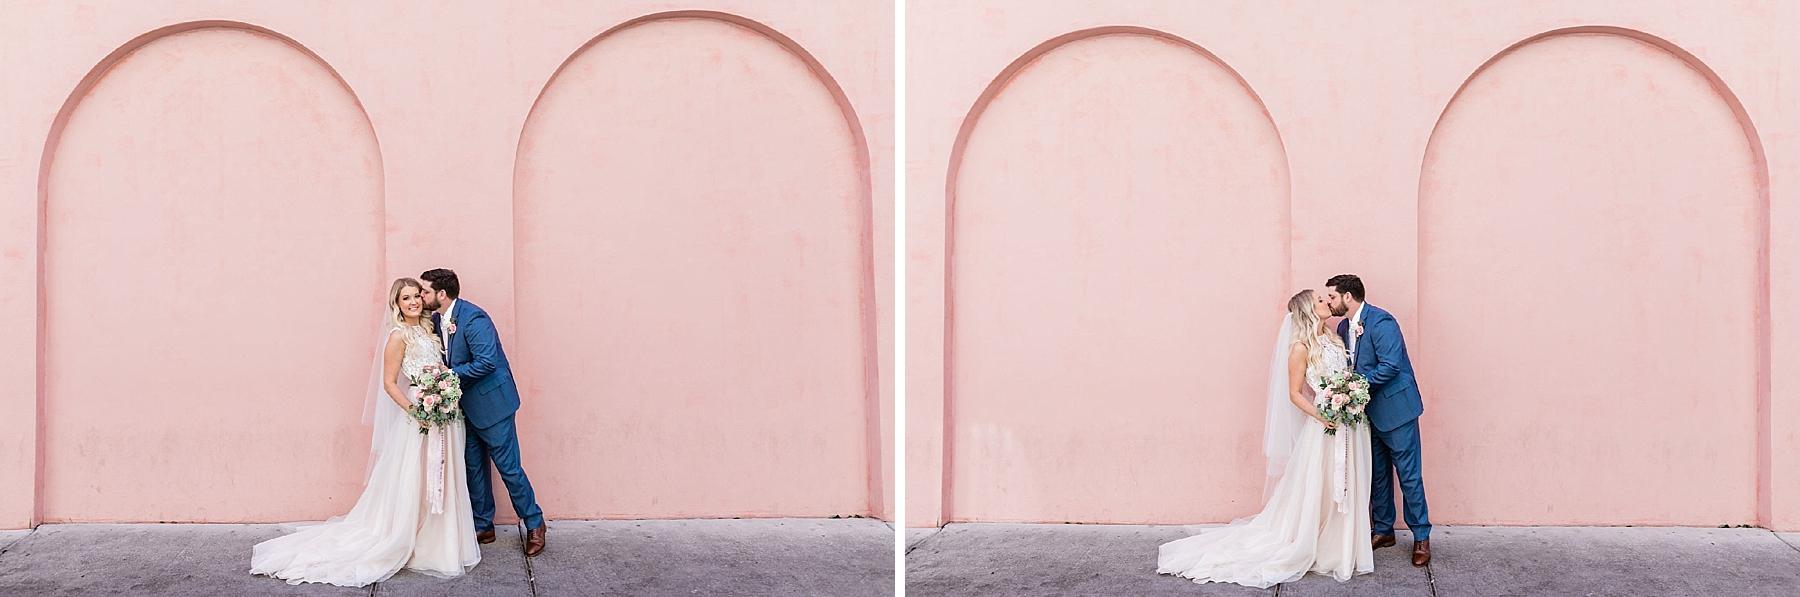 Carly + Clint's Savannah Elopement - Savannah and Olde Pink House Elopement | Apt. B Photography